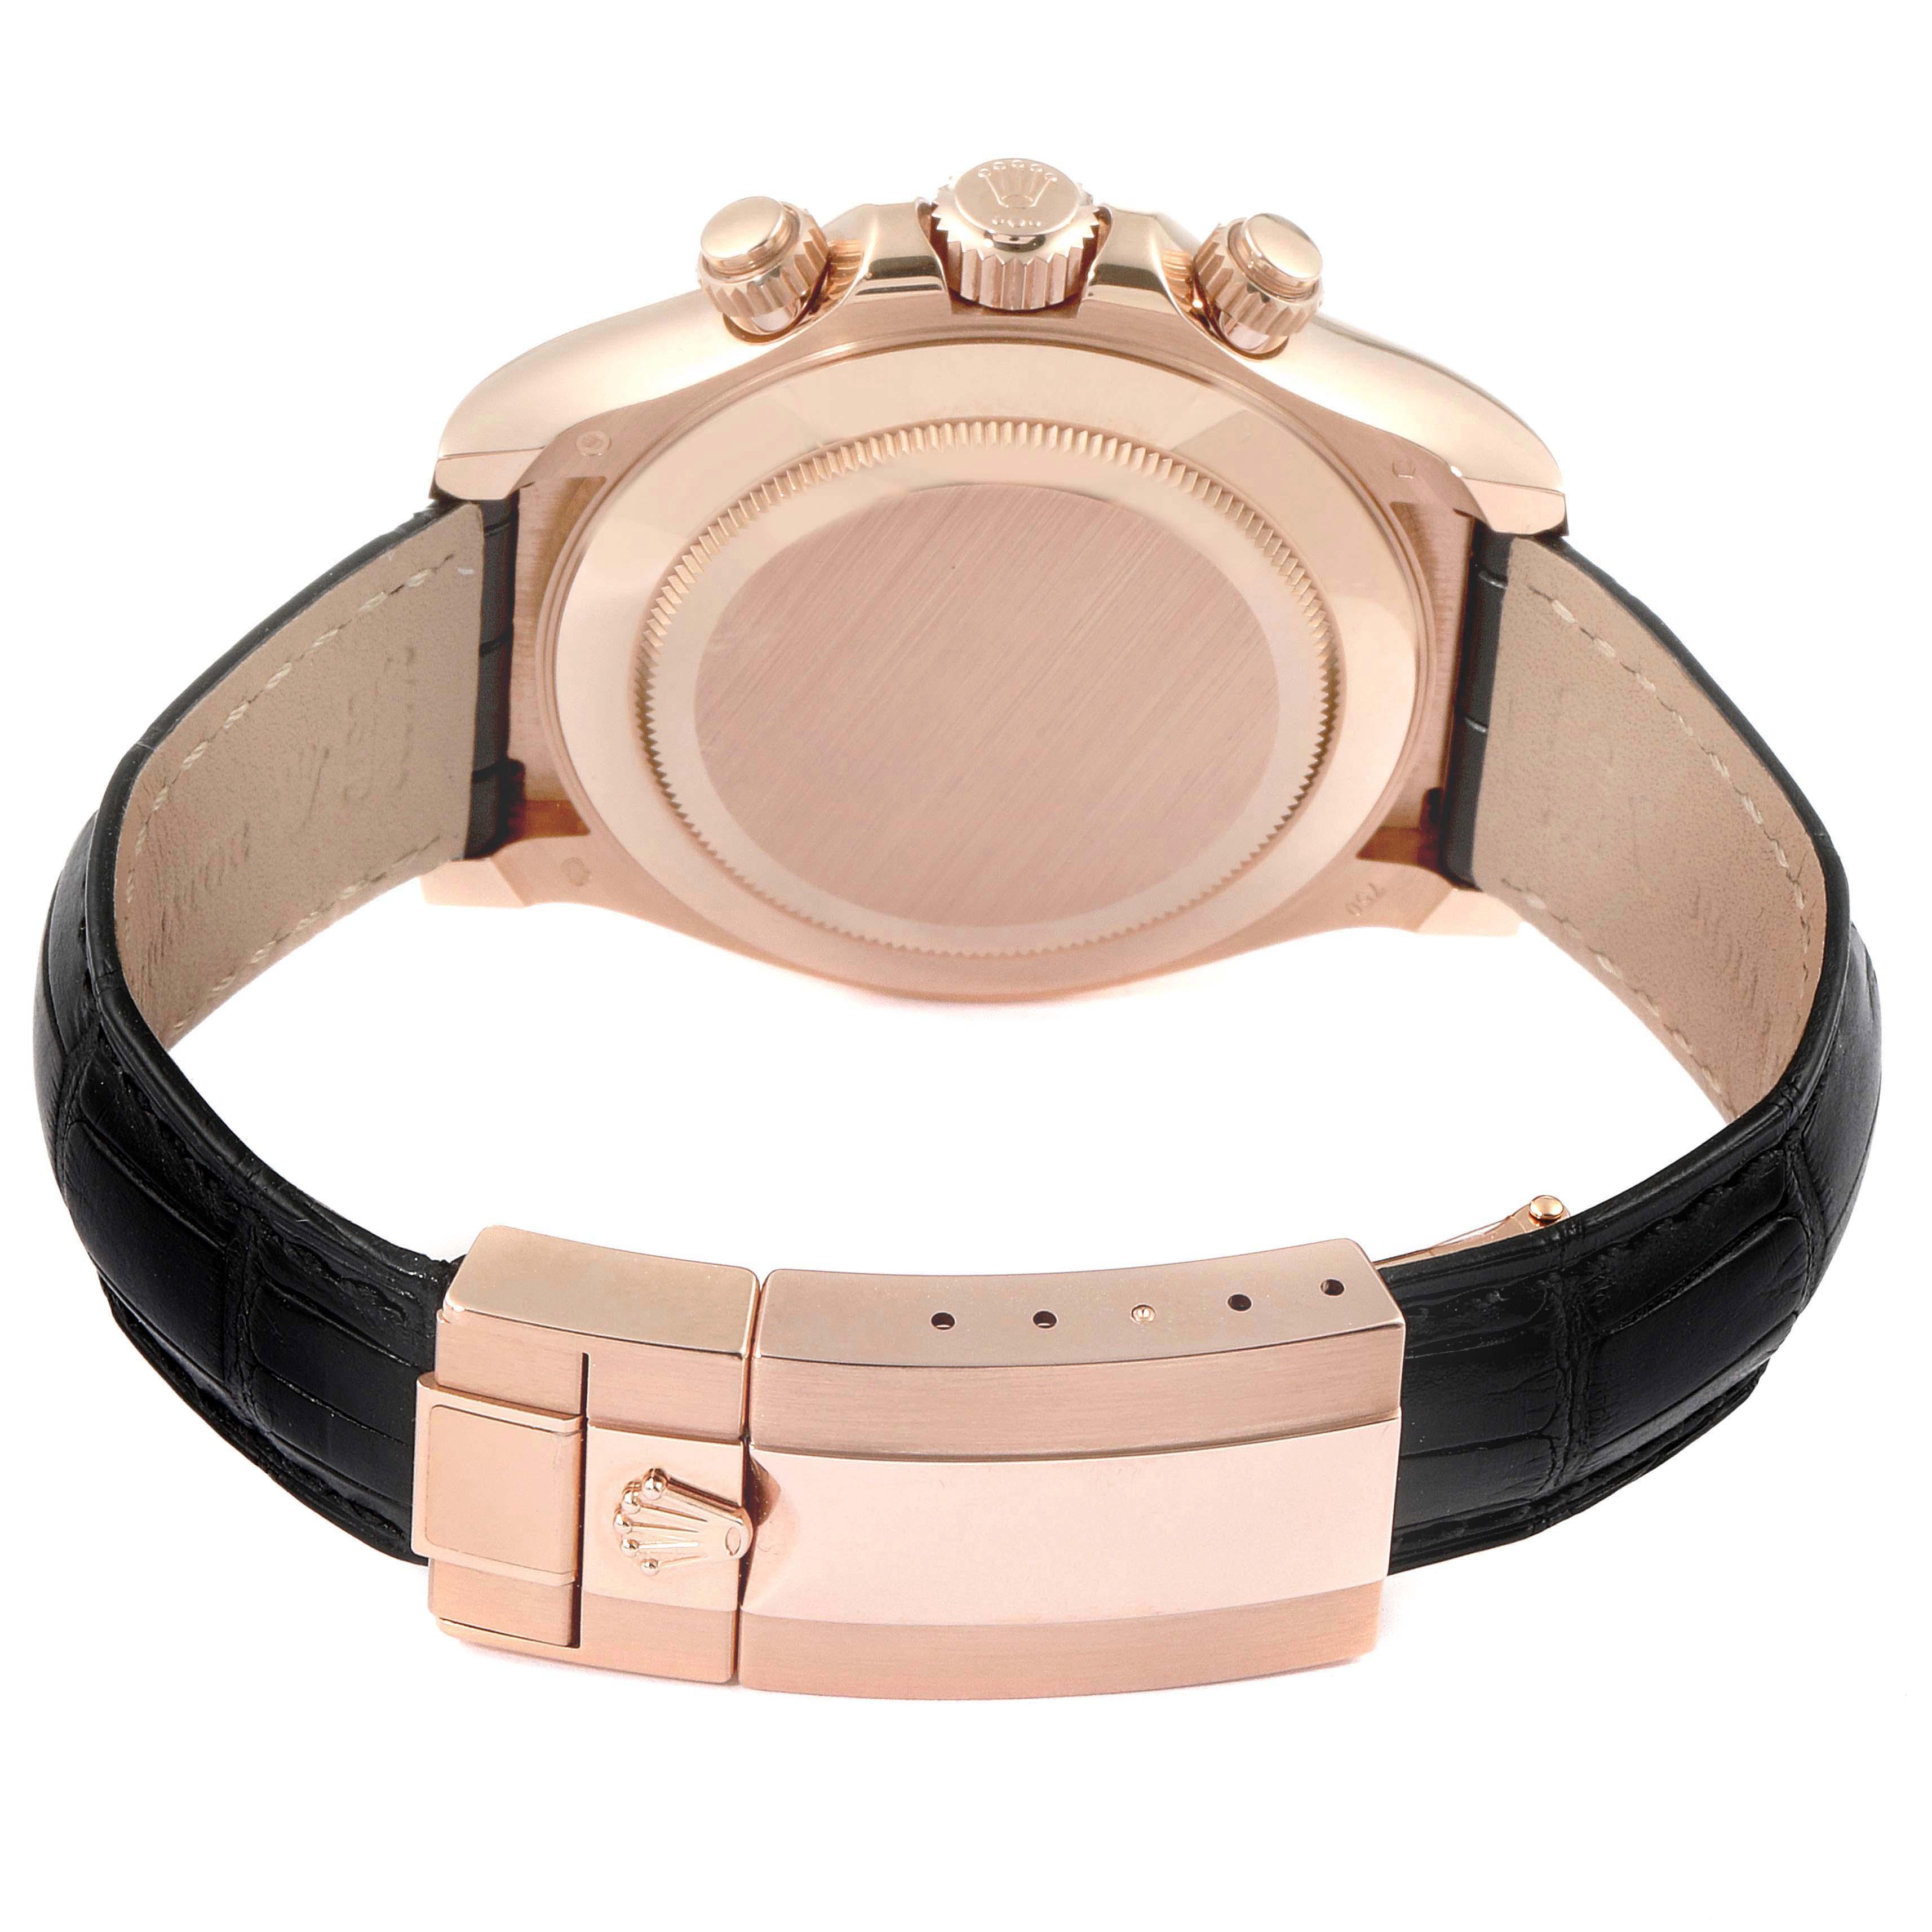 Rolex Cosmograph Daytona Rose Gold Everose Mens Watch 116515 Box Card SwissWatchExpo